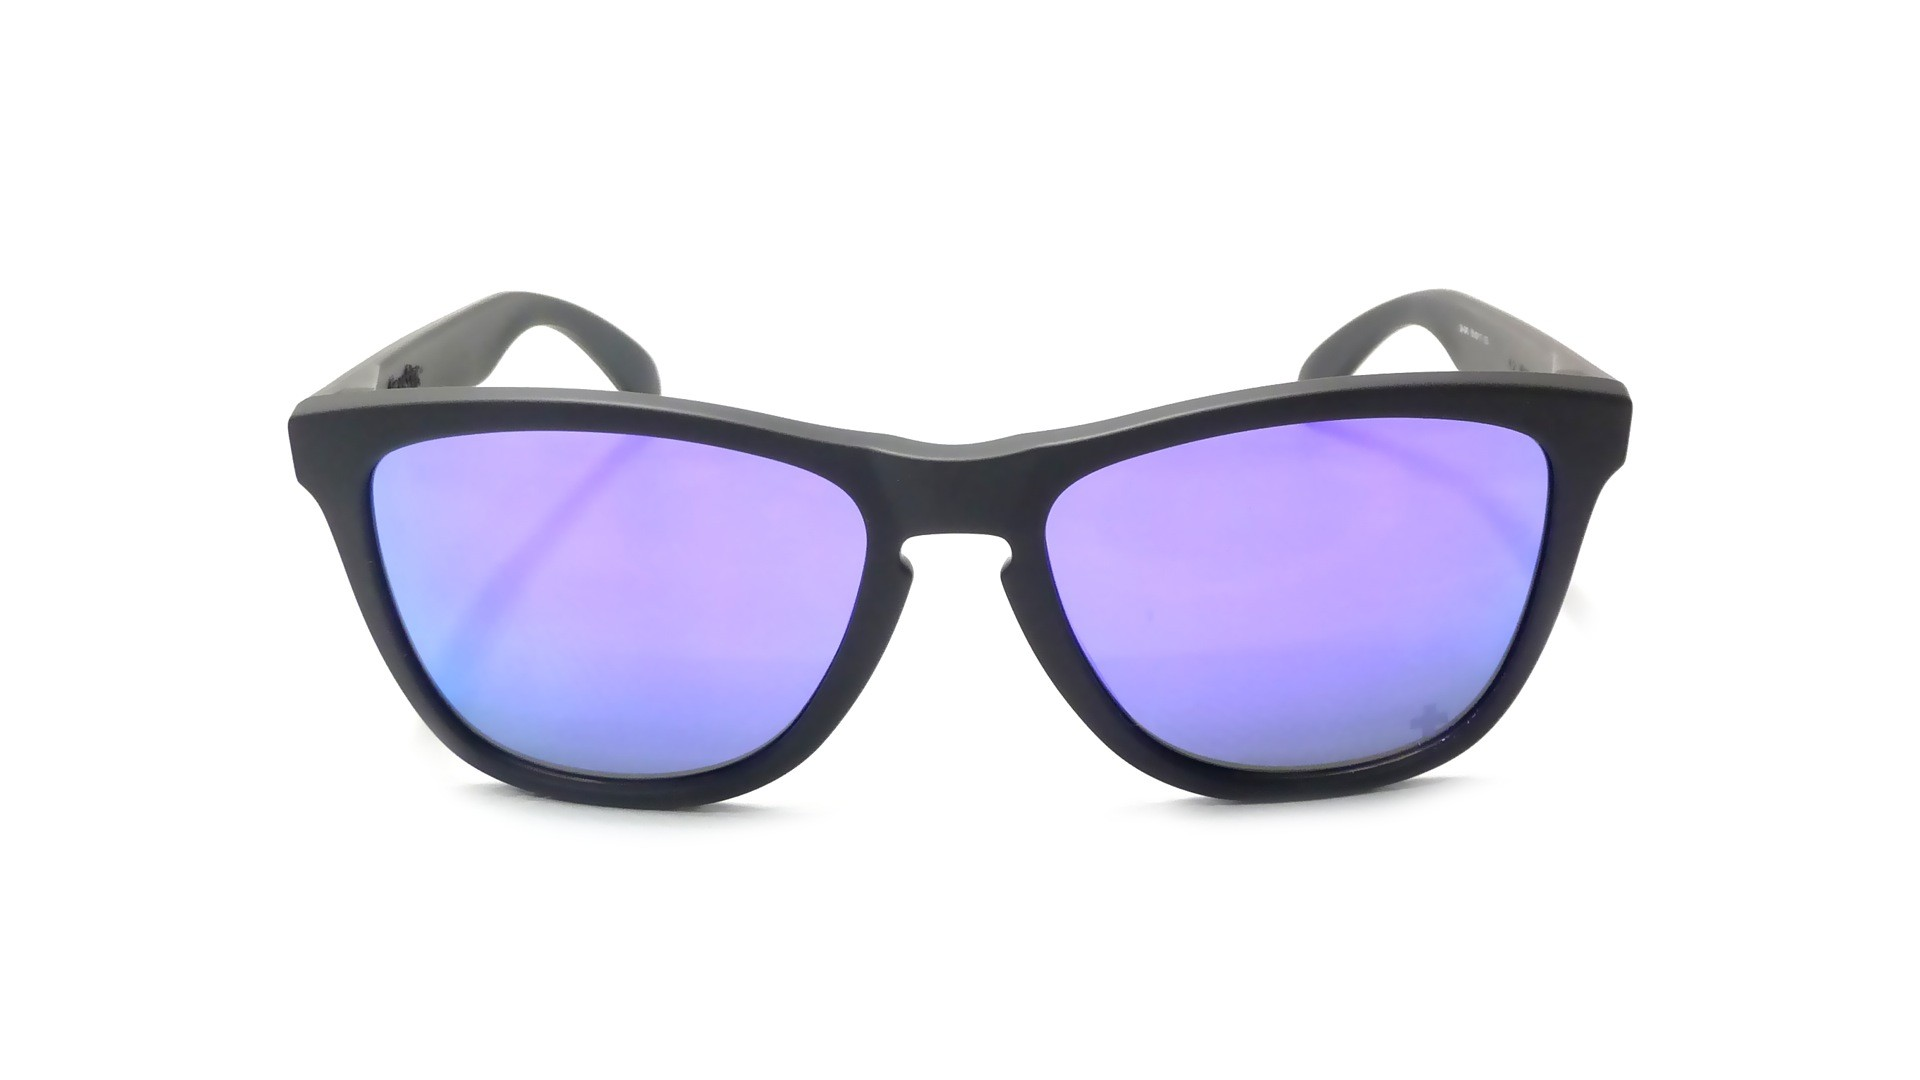 fdd751fa3 Oakley Infinite Hero Frogskins Sunglasses | City of Kenmore, Washington